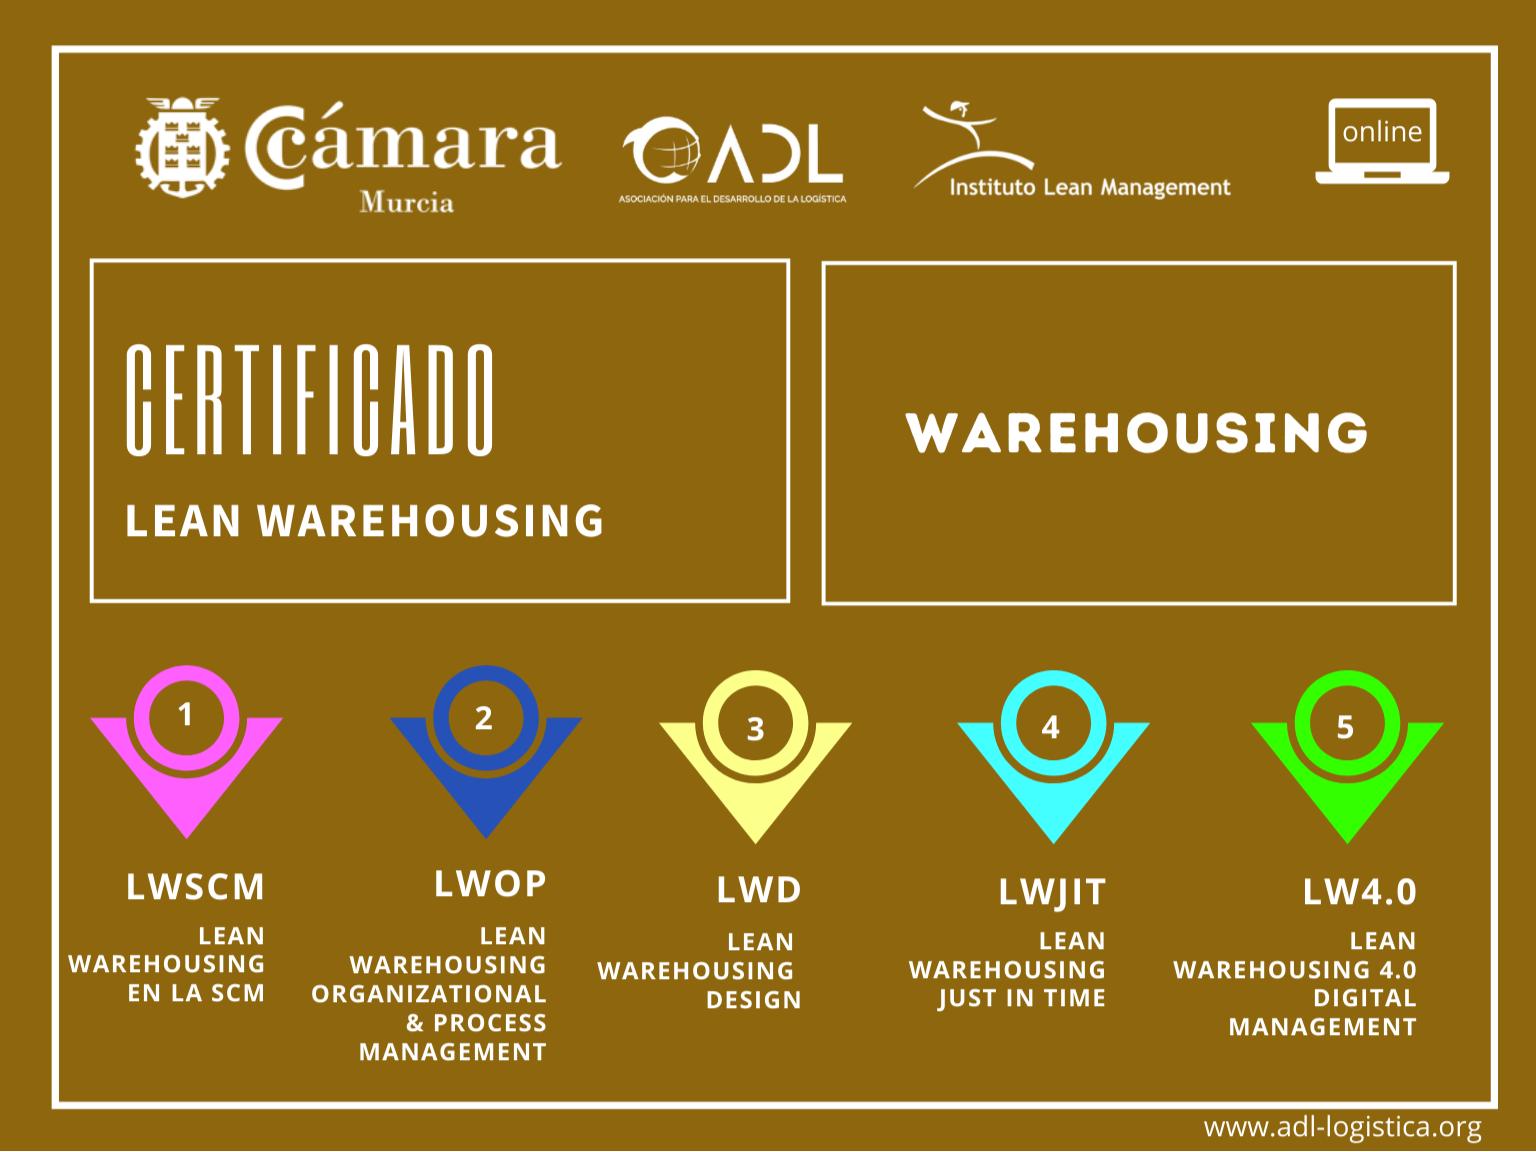 Certificado Lean Warehousing - Cámara de Comercio Murcia